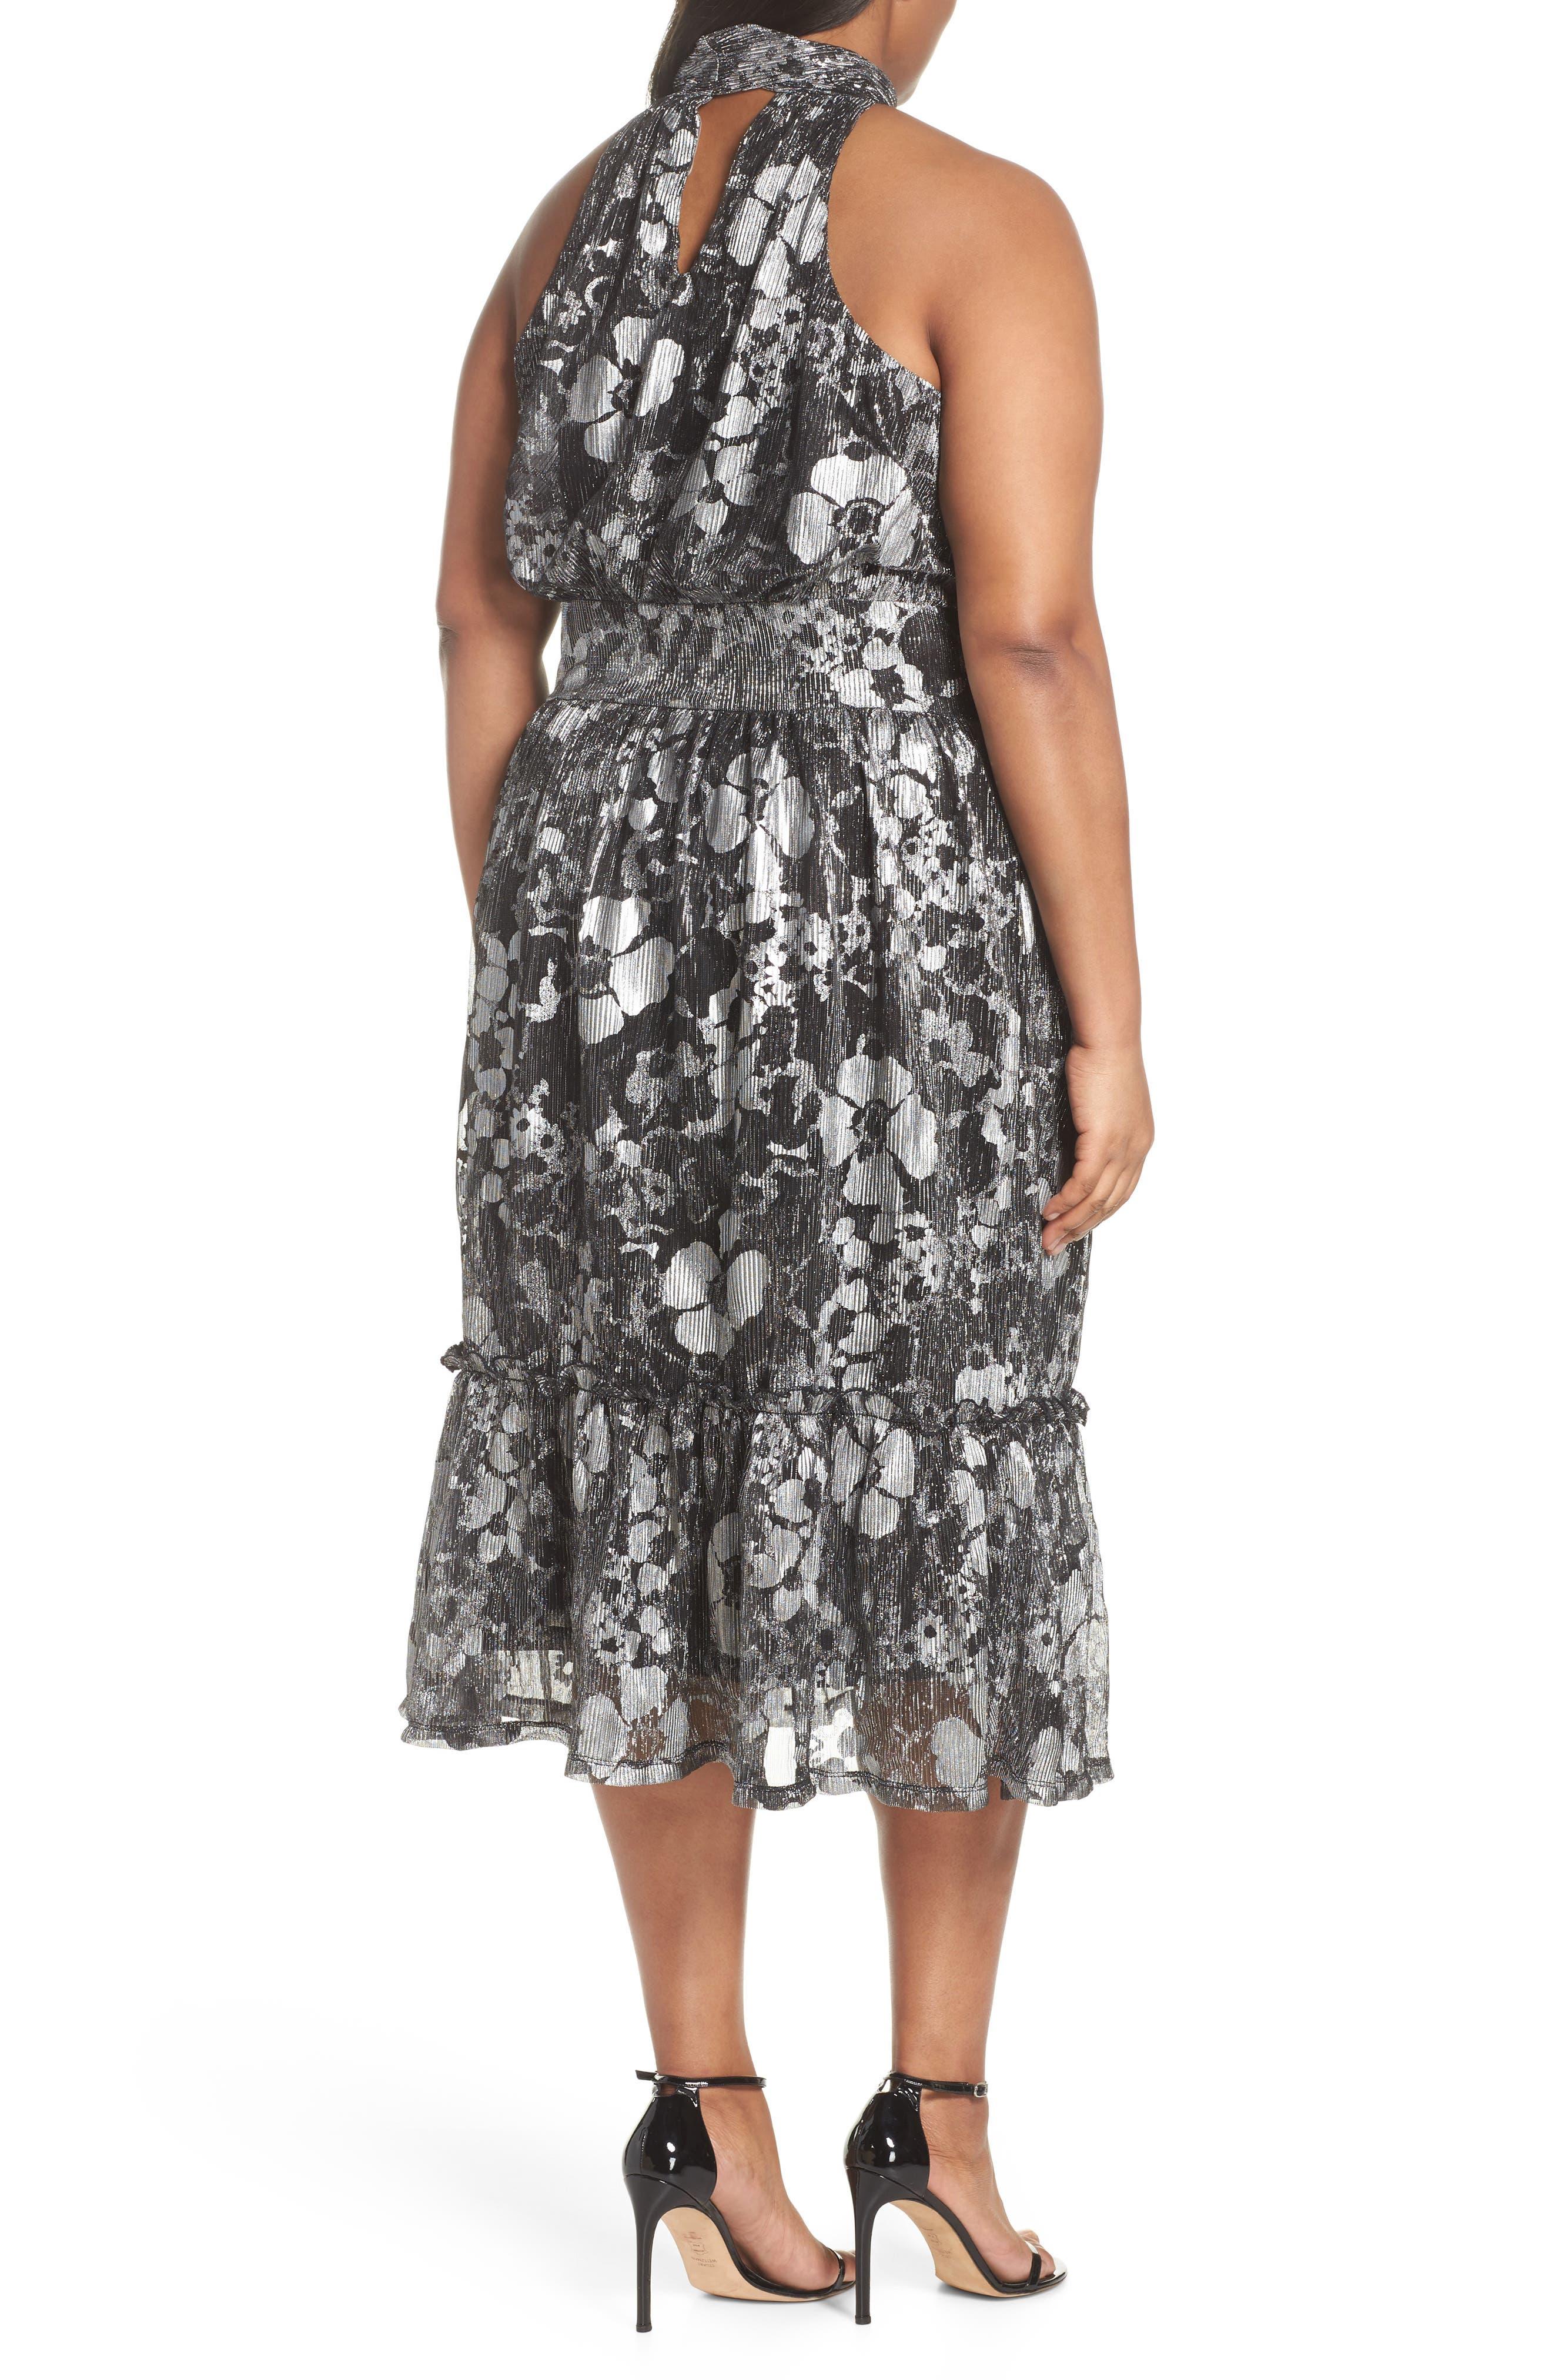 Floral Metallic Midi Dress,                             Alternate thumbnail 2, color,                             Black/ Silver Foil